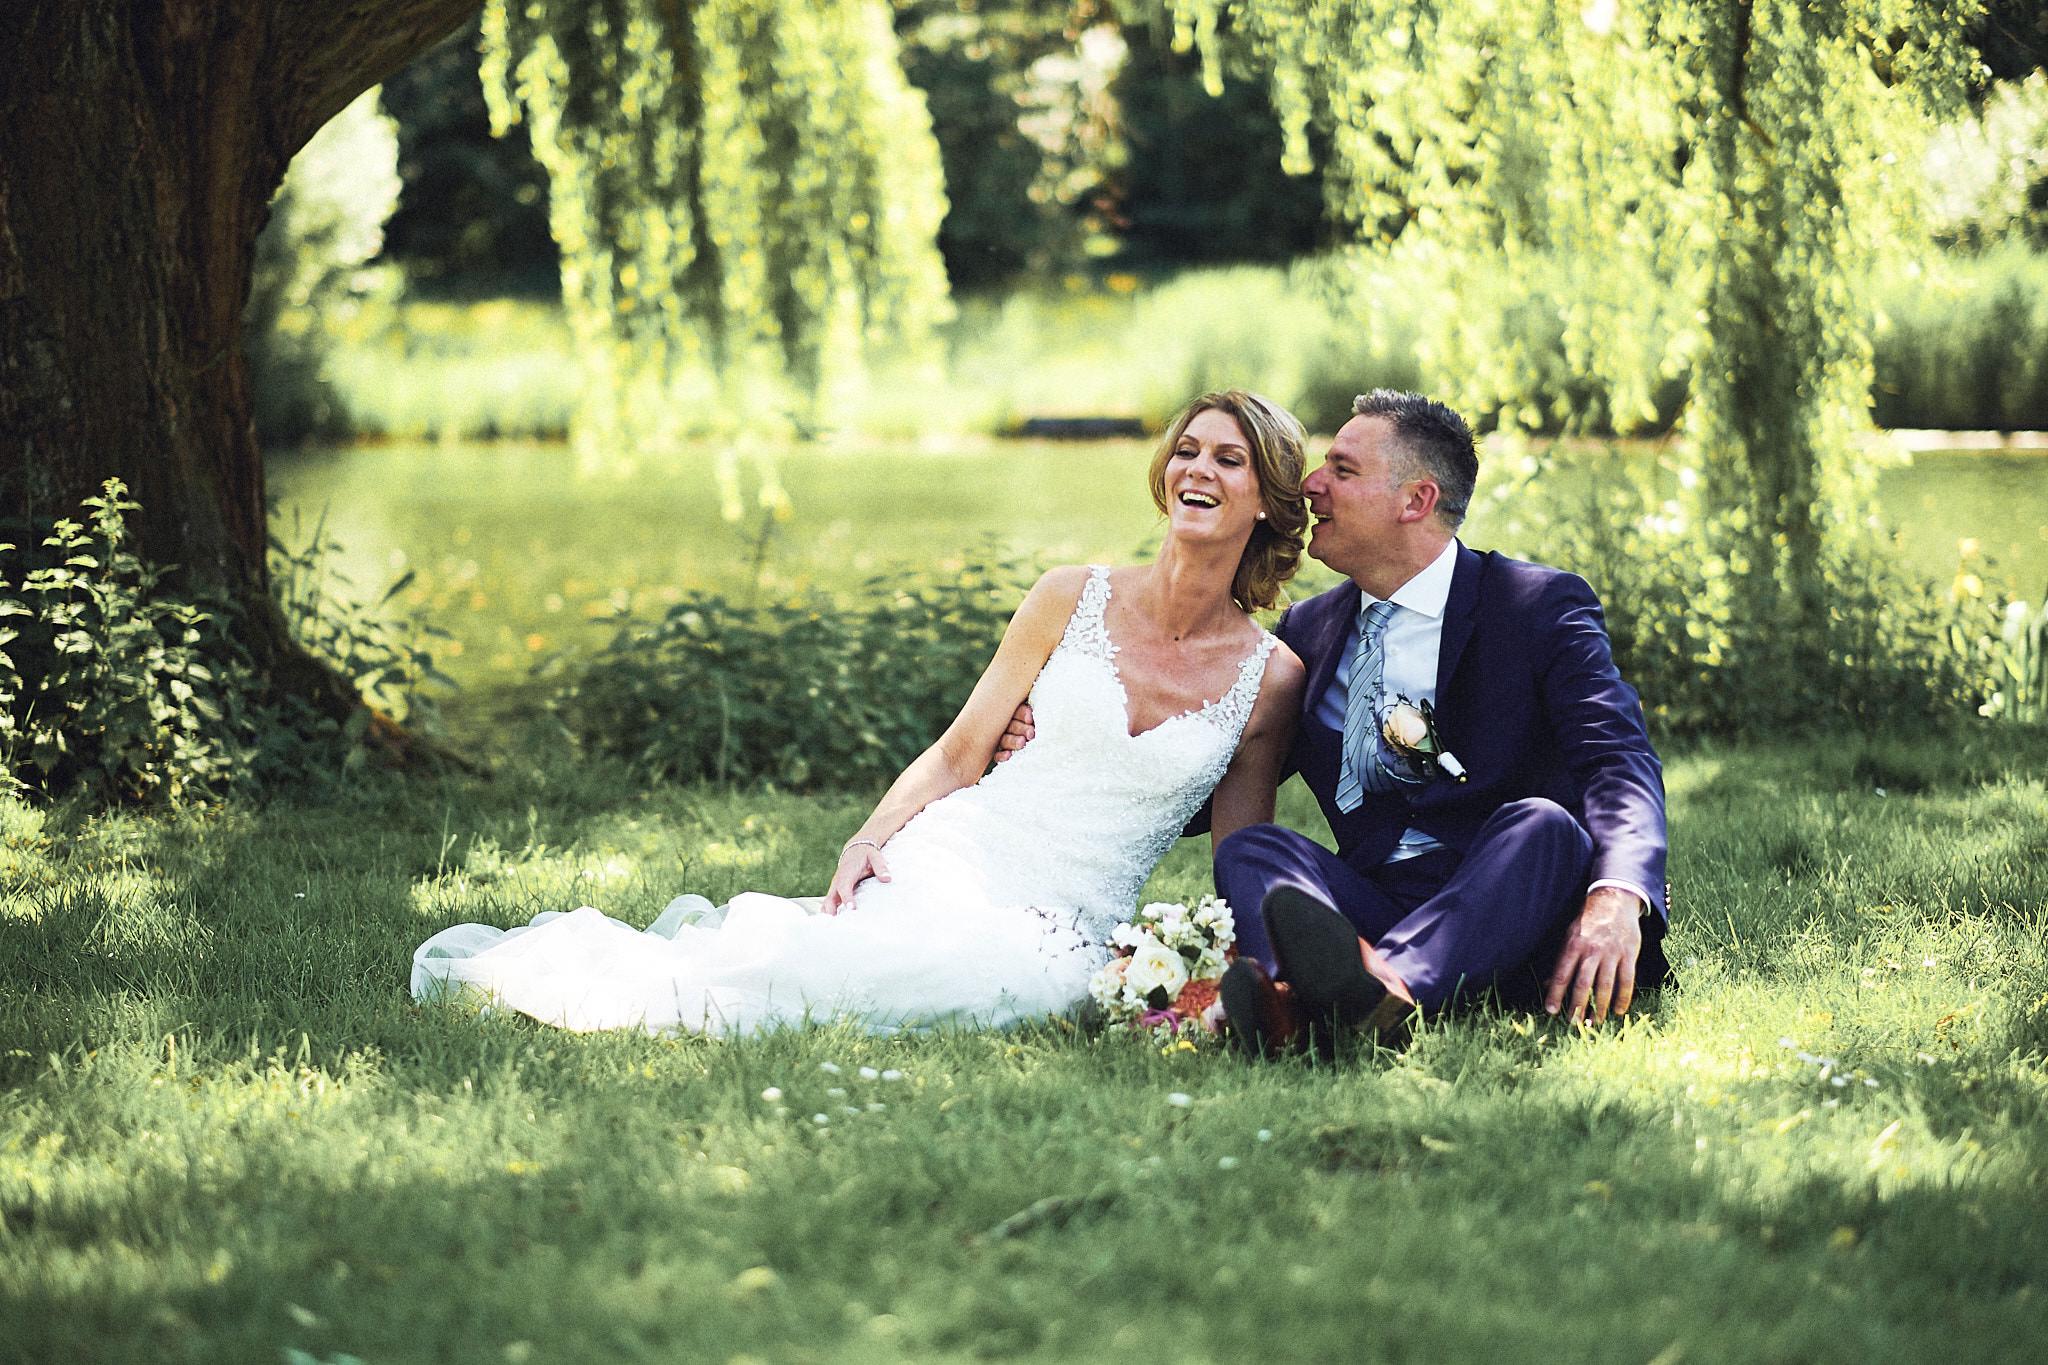 bruidsfotografie-trouwreportage-Delft-Ingrid-Richard_1433.jpg